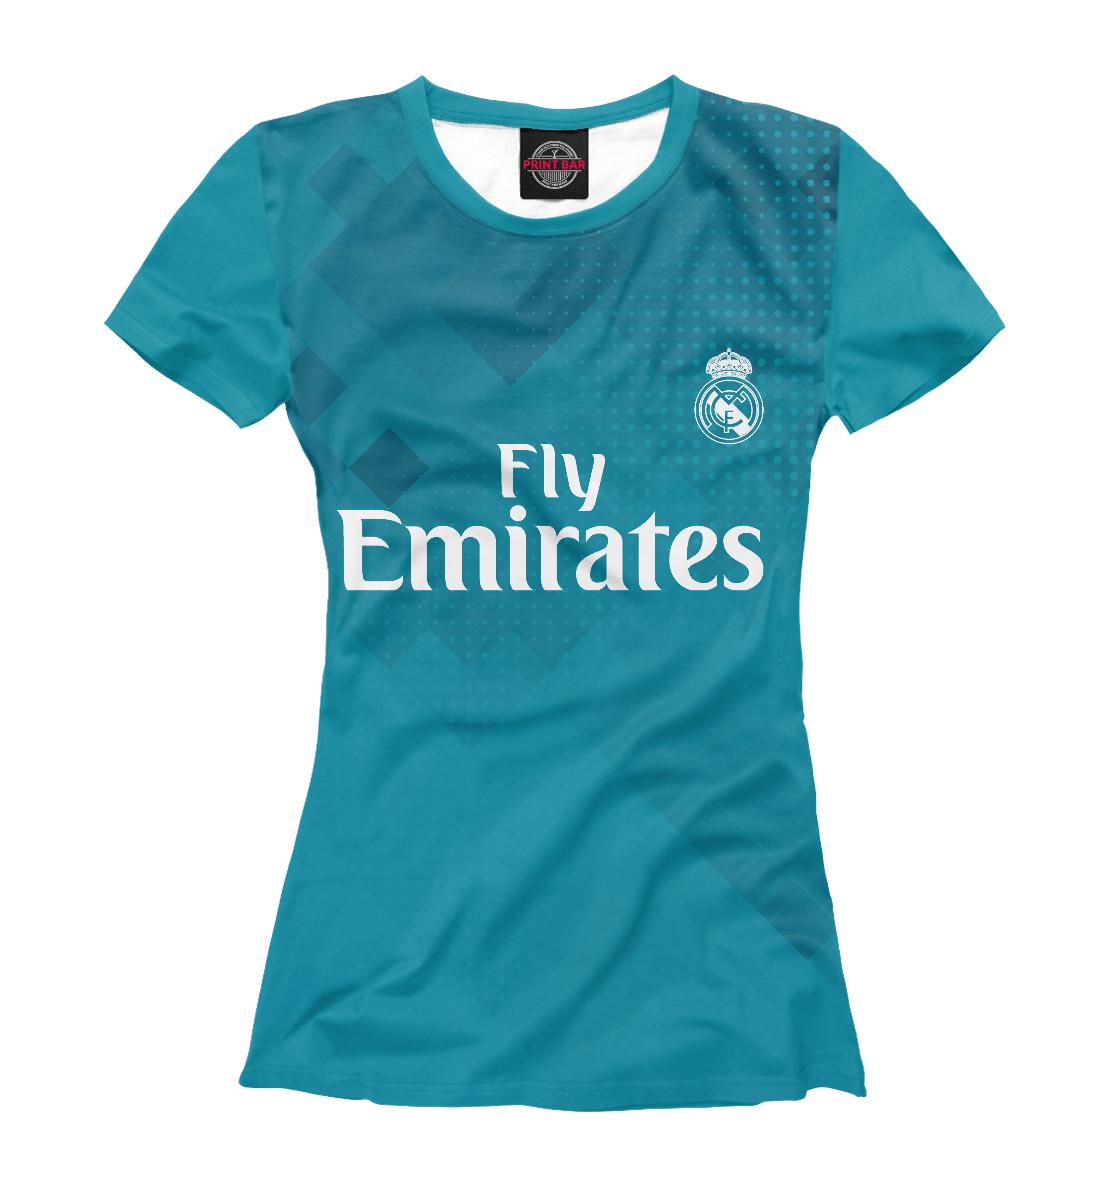 Купить Реал Мадрид, Printbar, Футболки, REA-395951-fut-1